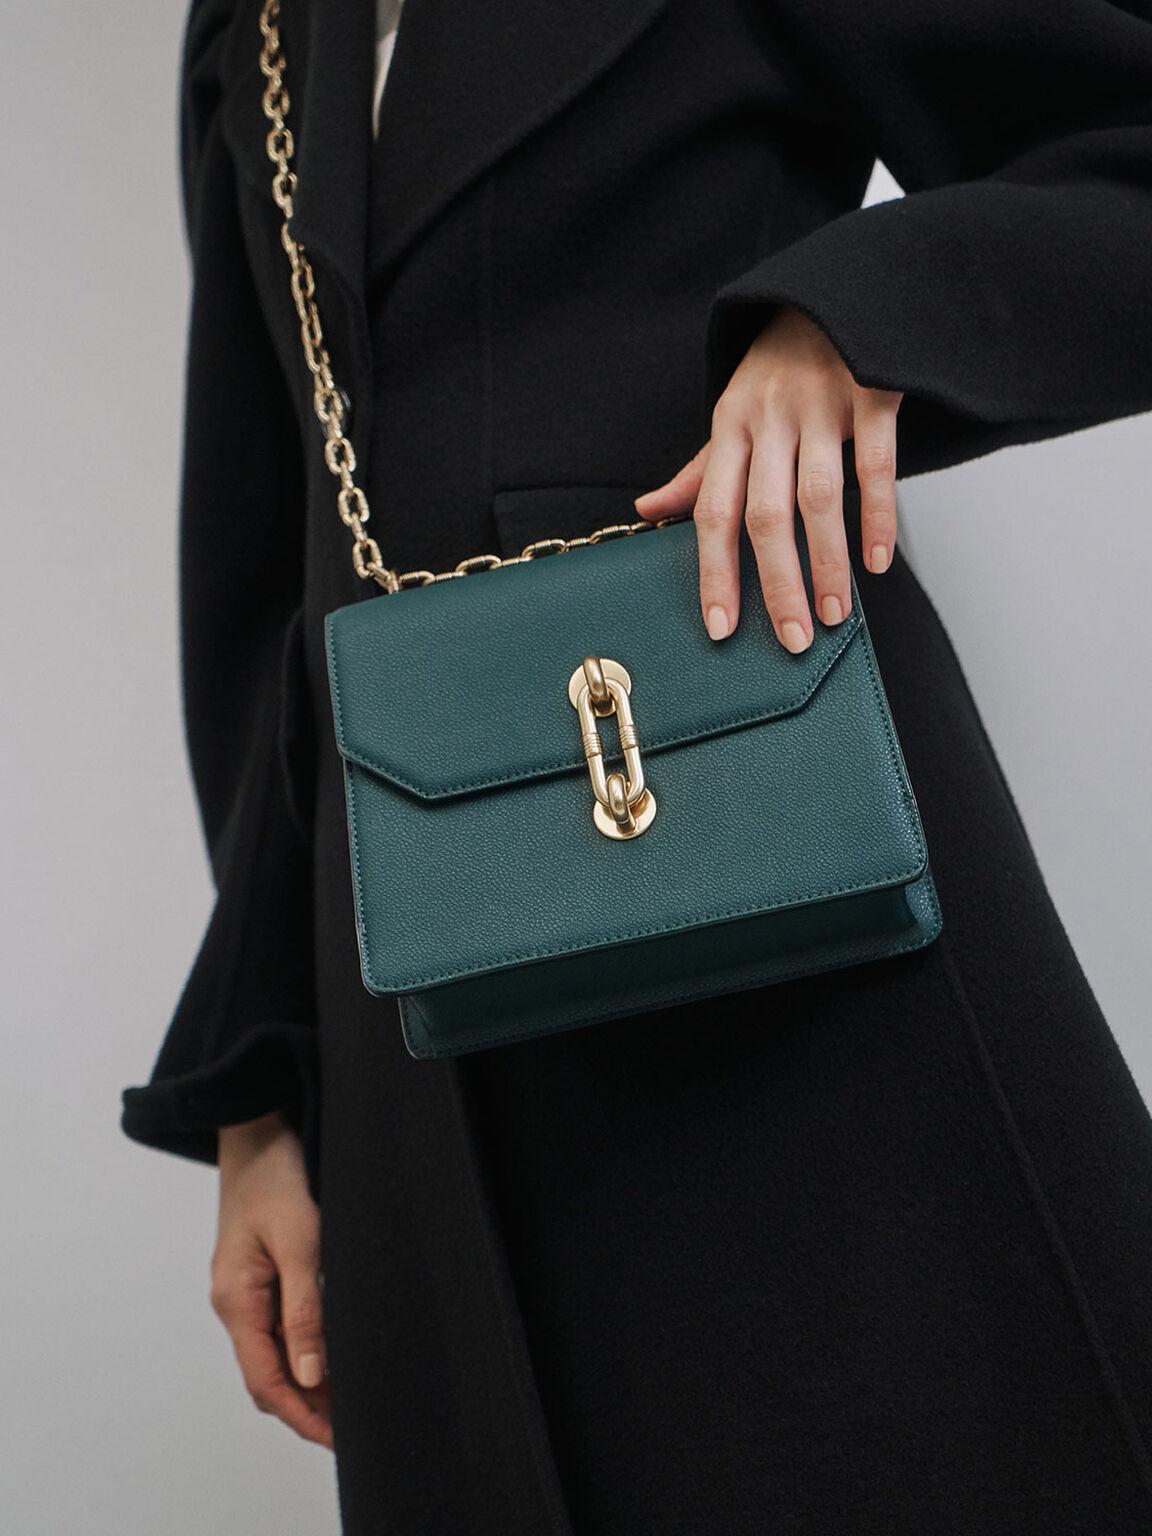 Double Chain Strap Turn-Lock Bag, Green, hi-res